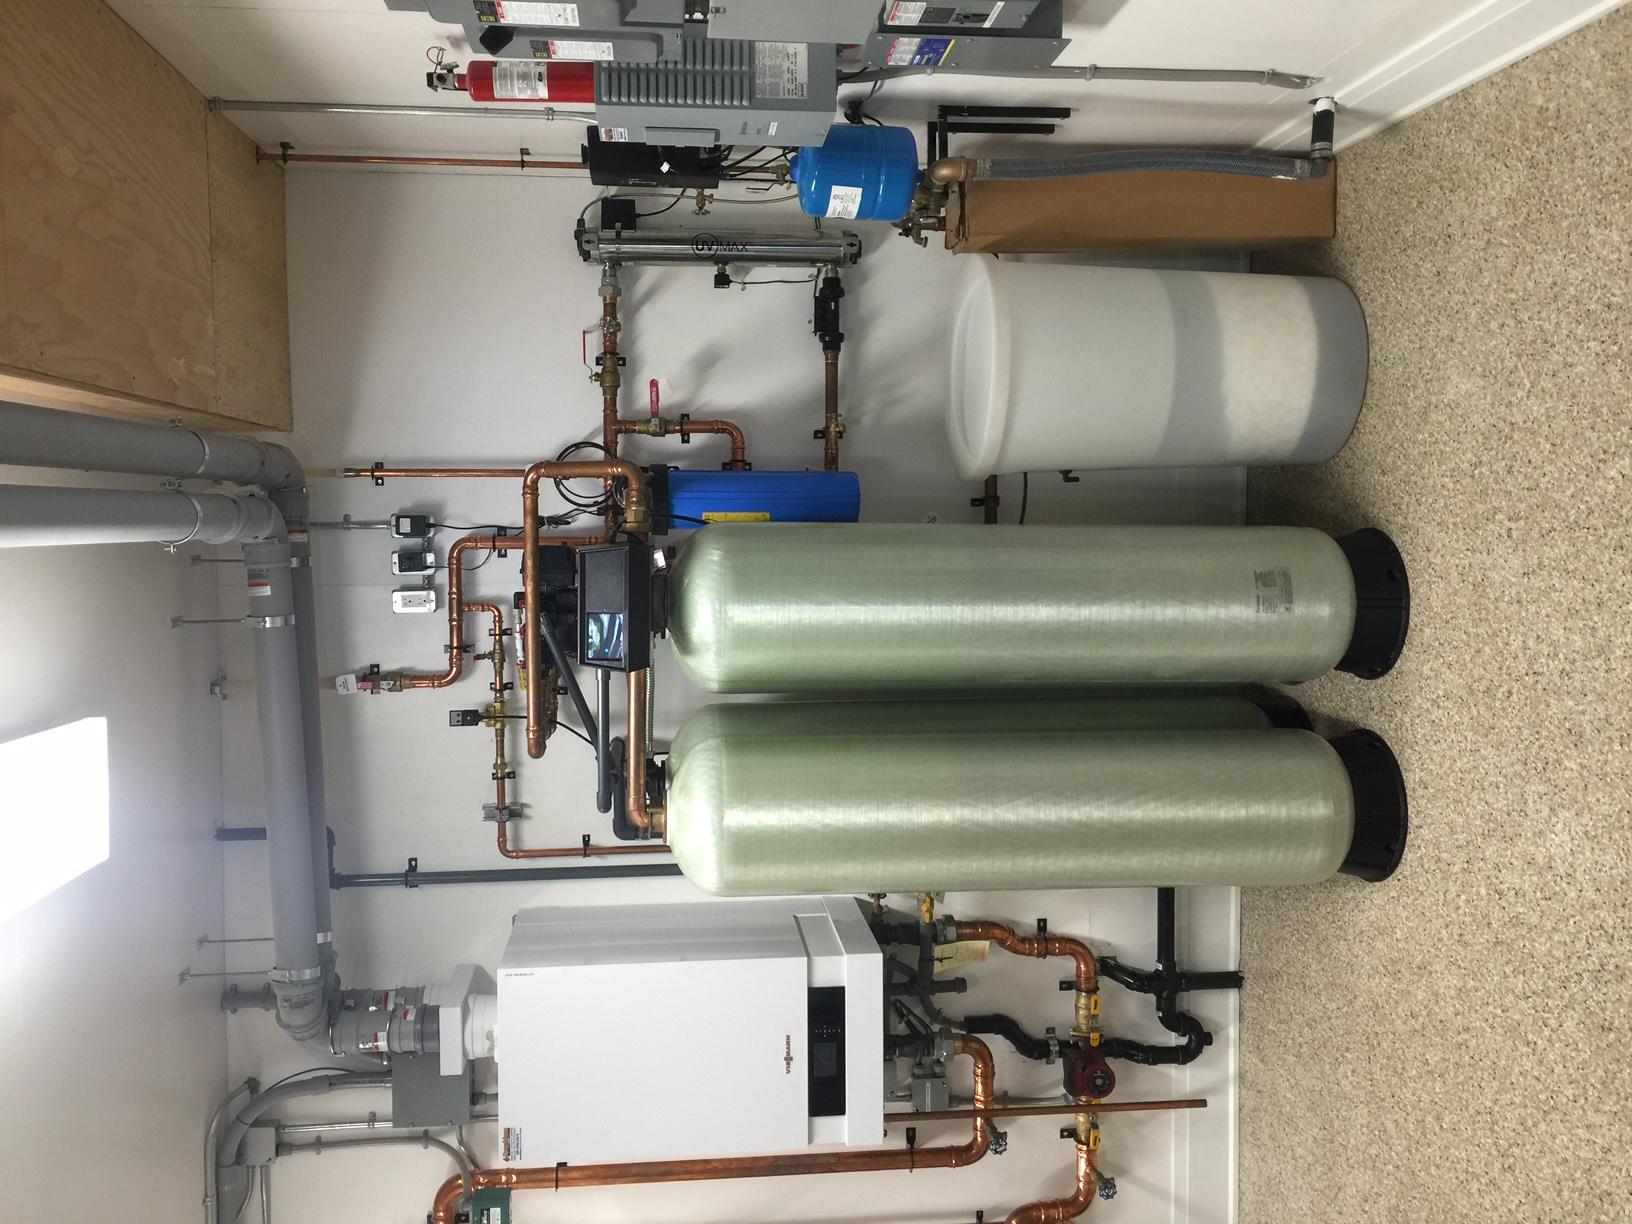 Donaldson Plumbing & Heating